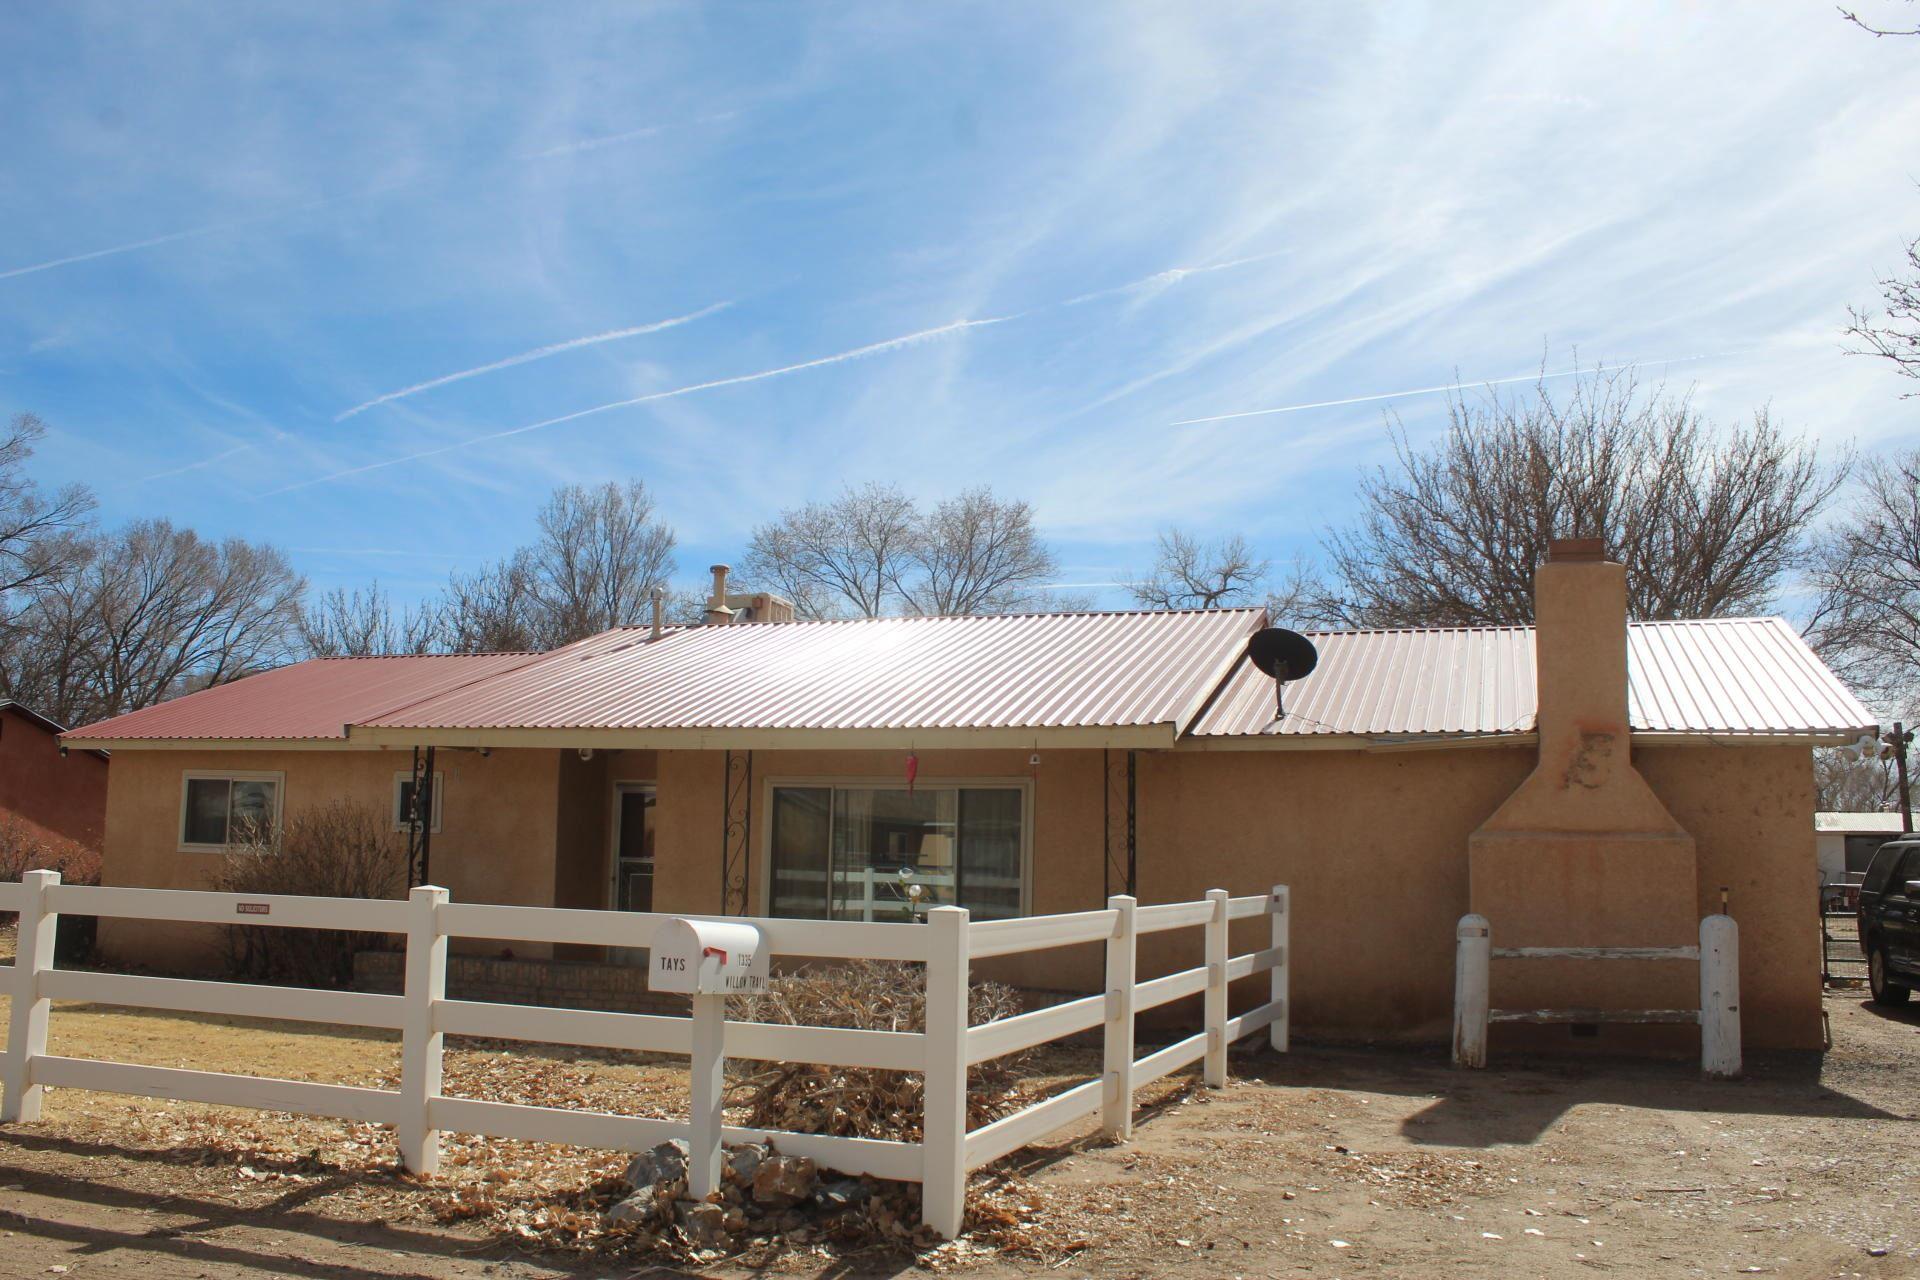 1335 WILLOW Trail, Bosque Farms, NM 87068 - MLS#: 985484